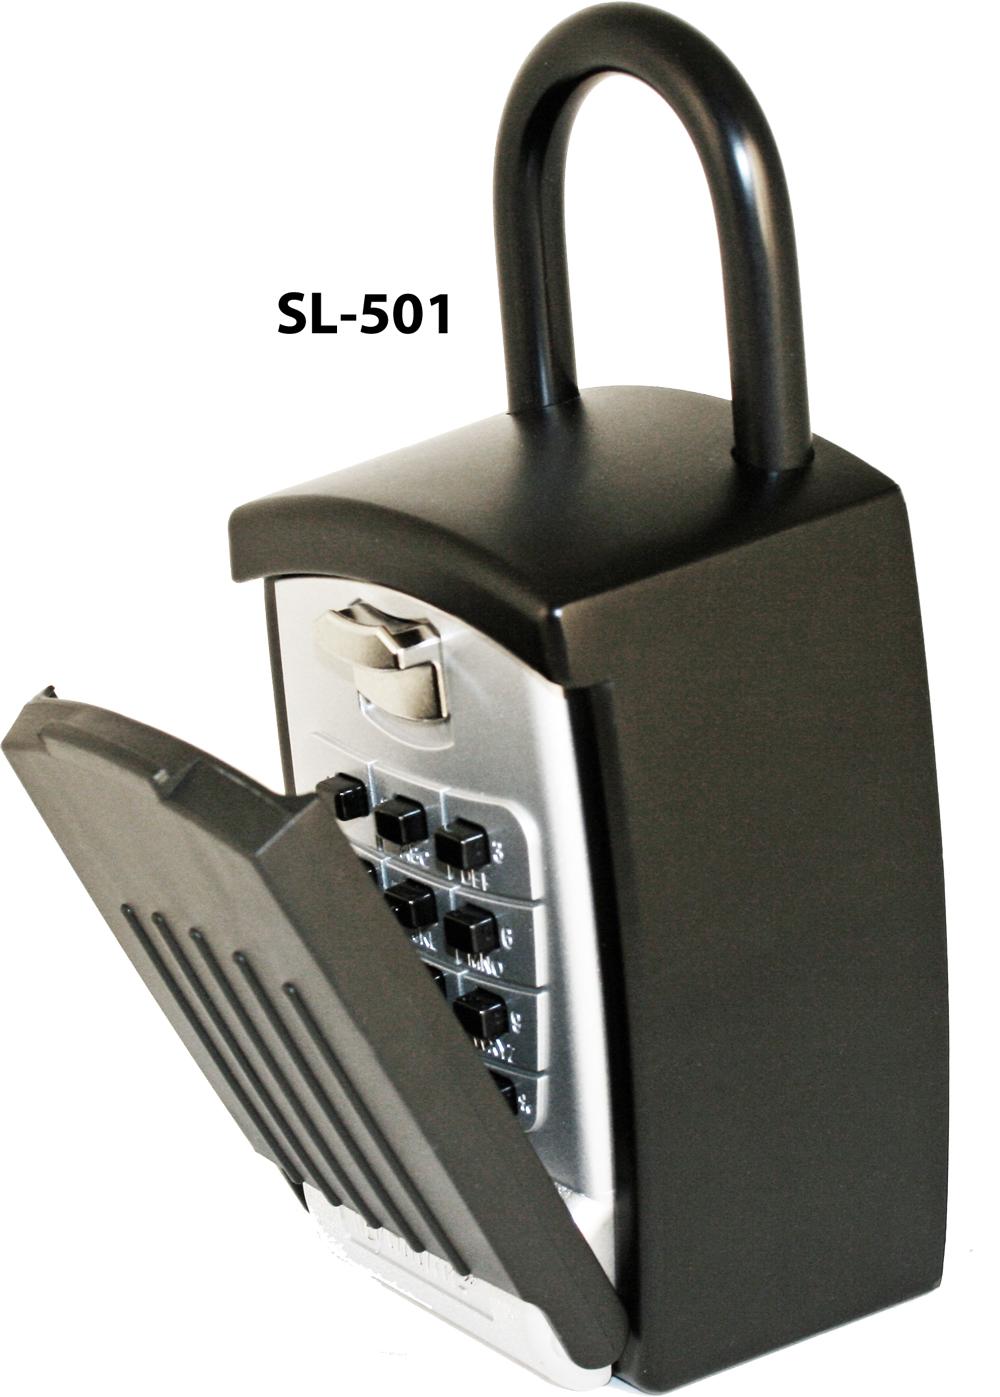 Lockbox Key Lockbox Lockbox Realtor Lockbox Lock Box